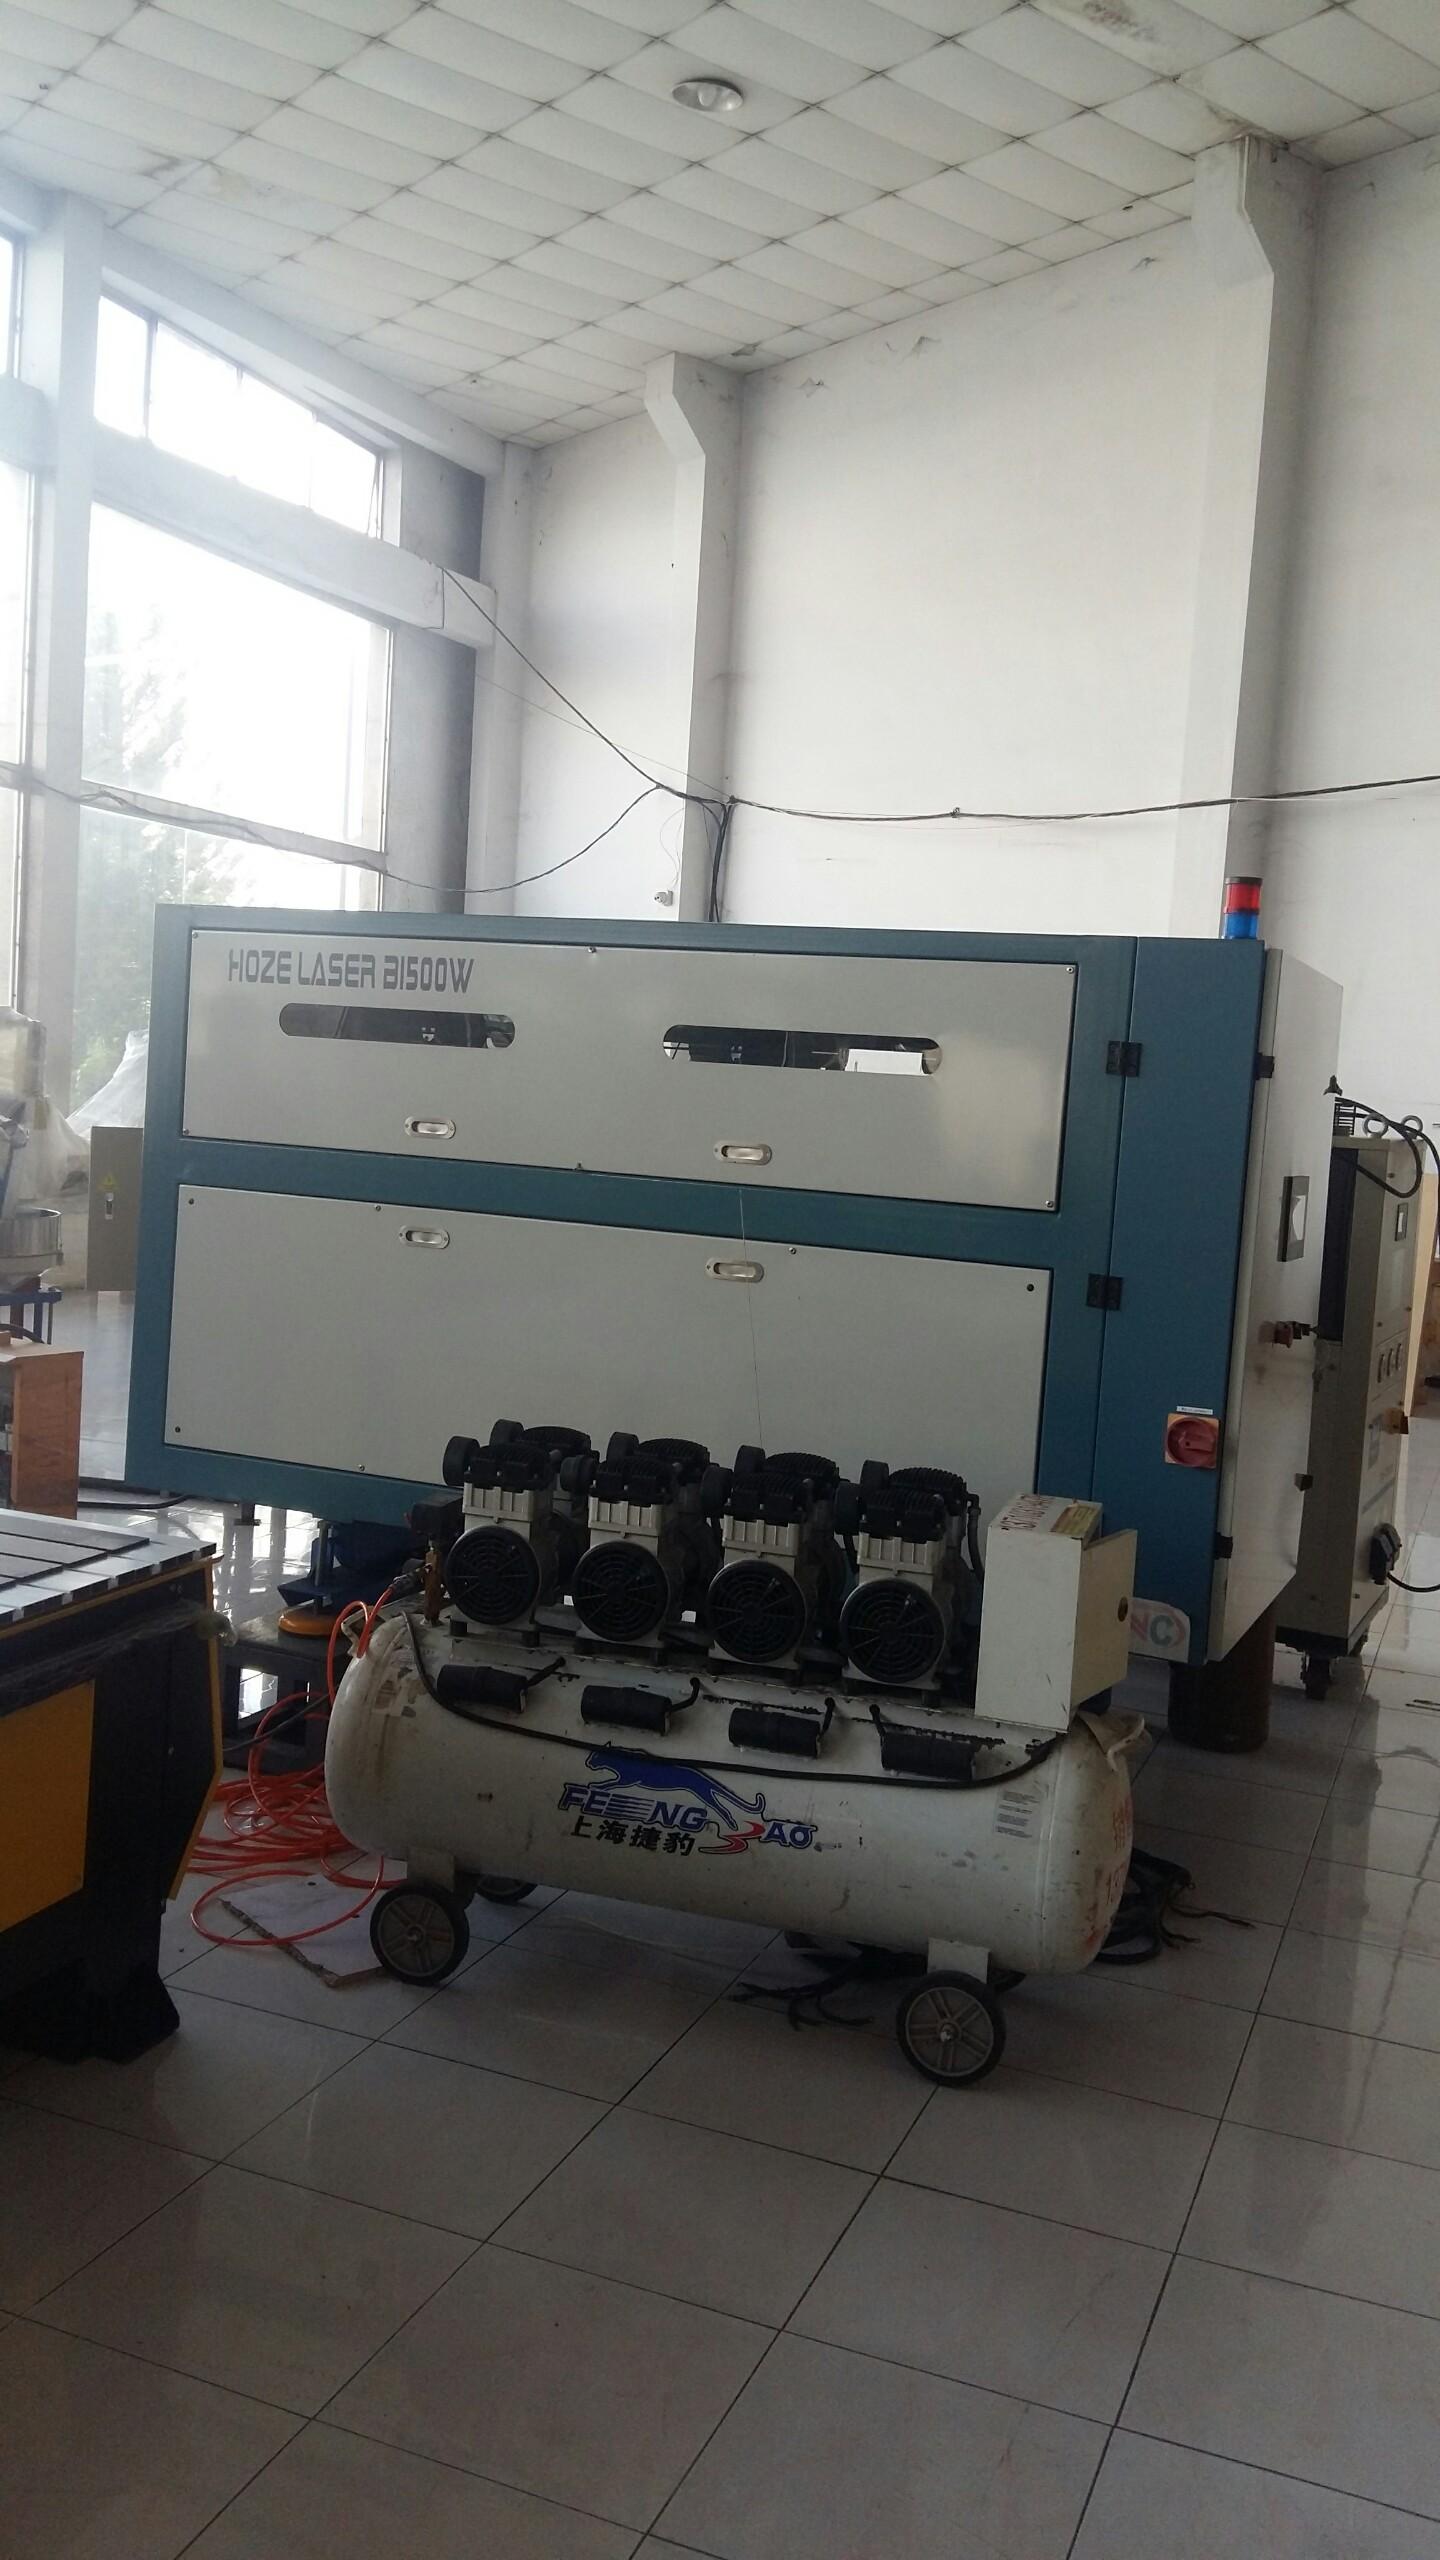 máy laser chuyên cắt gỗ hoze laser B1500w